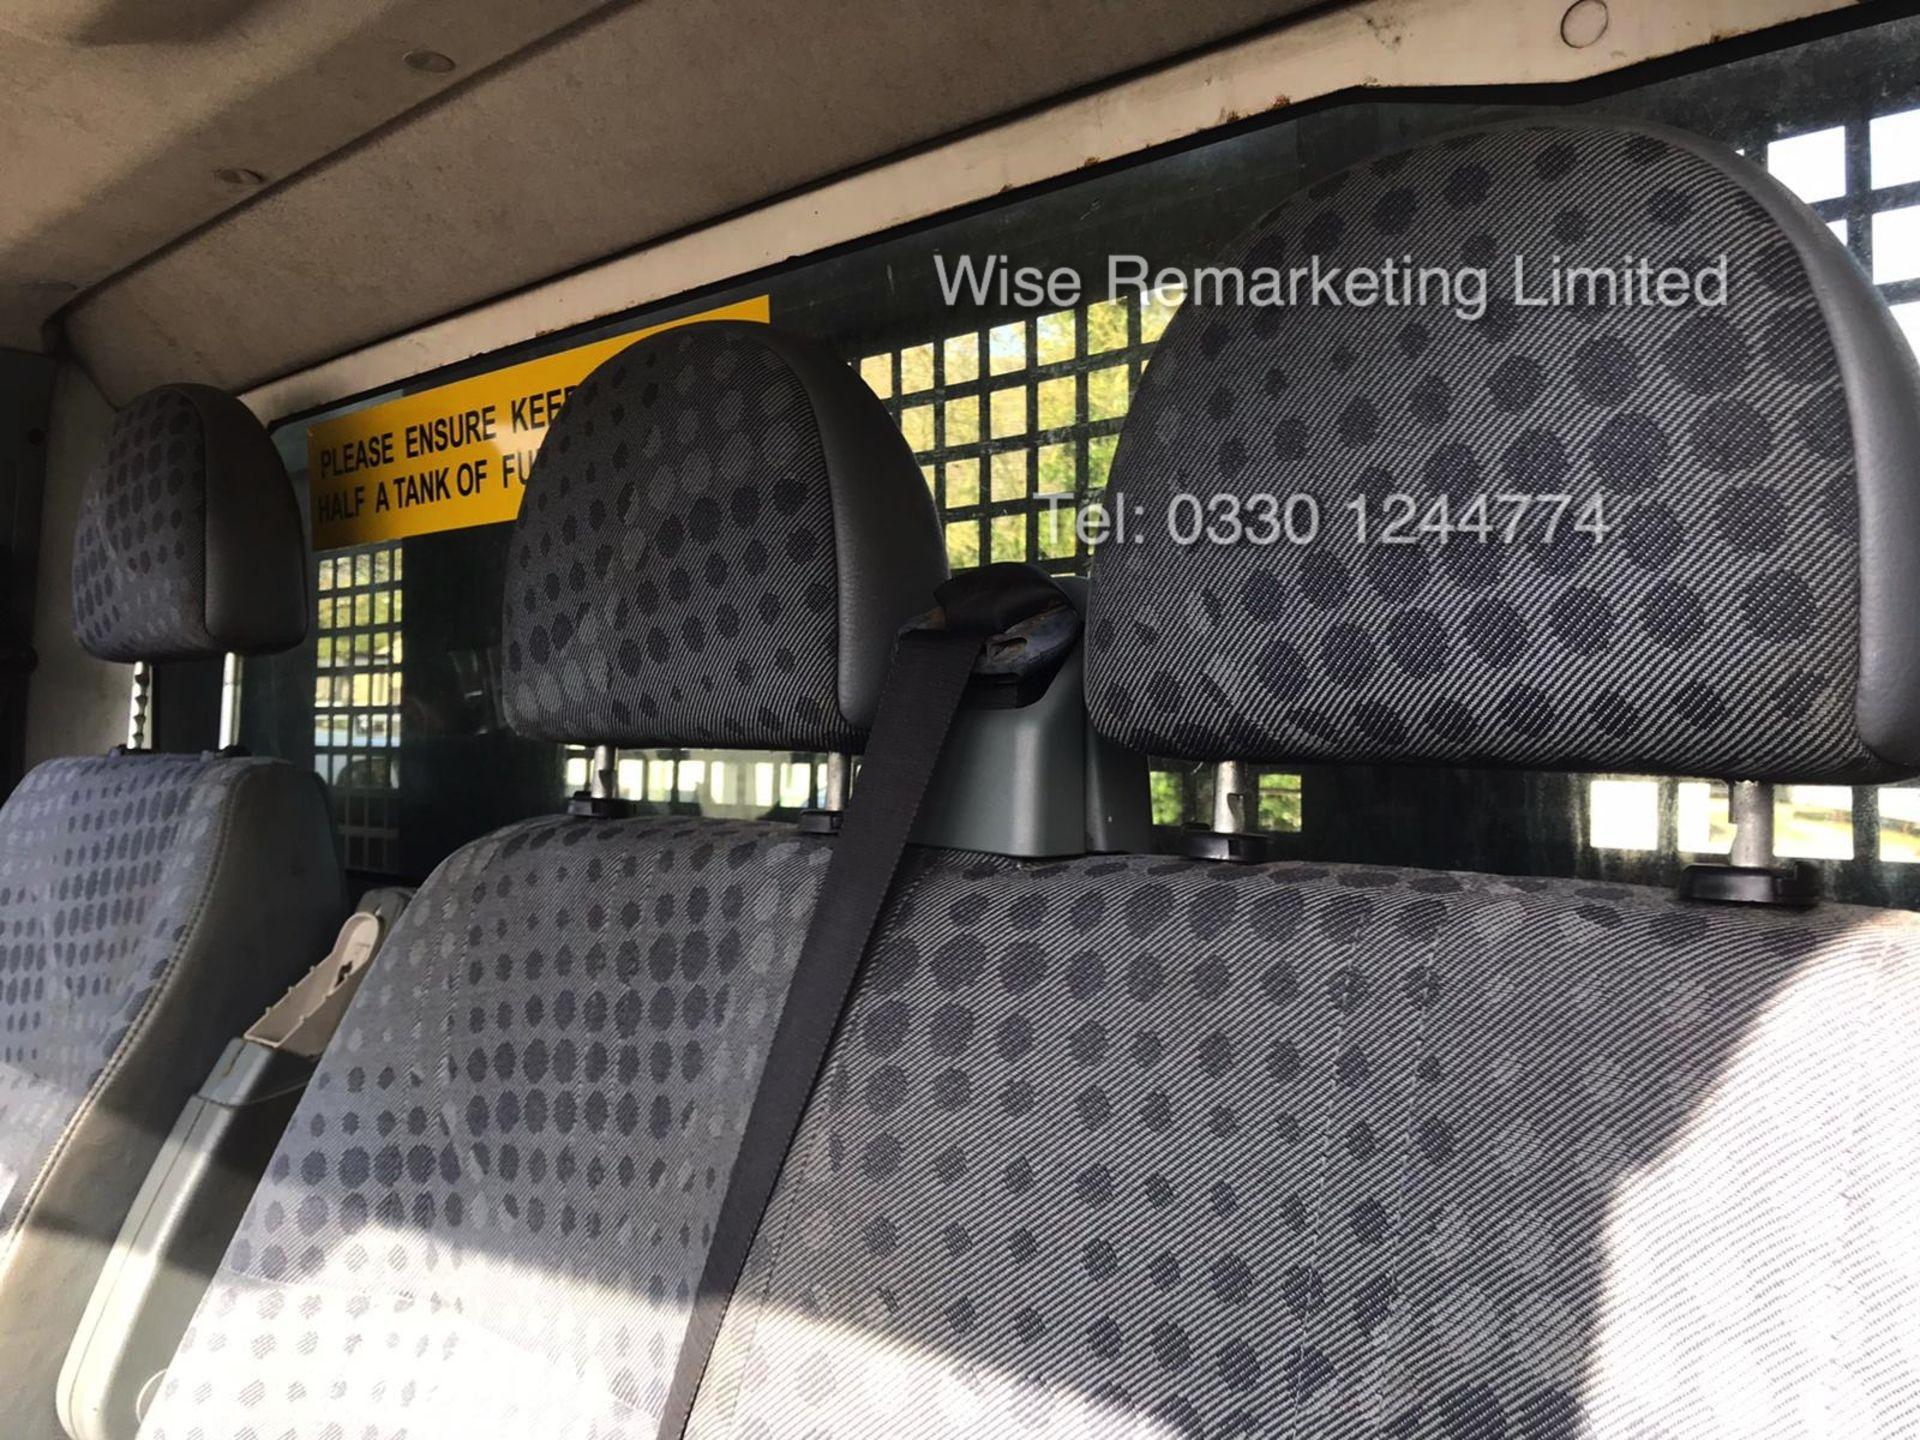 Lot 38 - Ford Transit 350 2.4 TDCI Tipper - 2012 Model - 1 Keeper From New